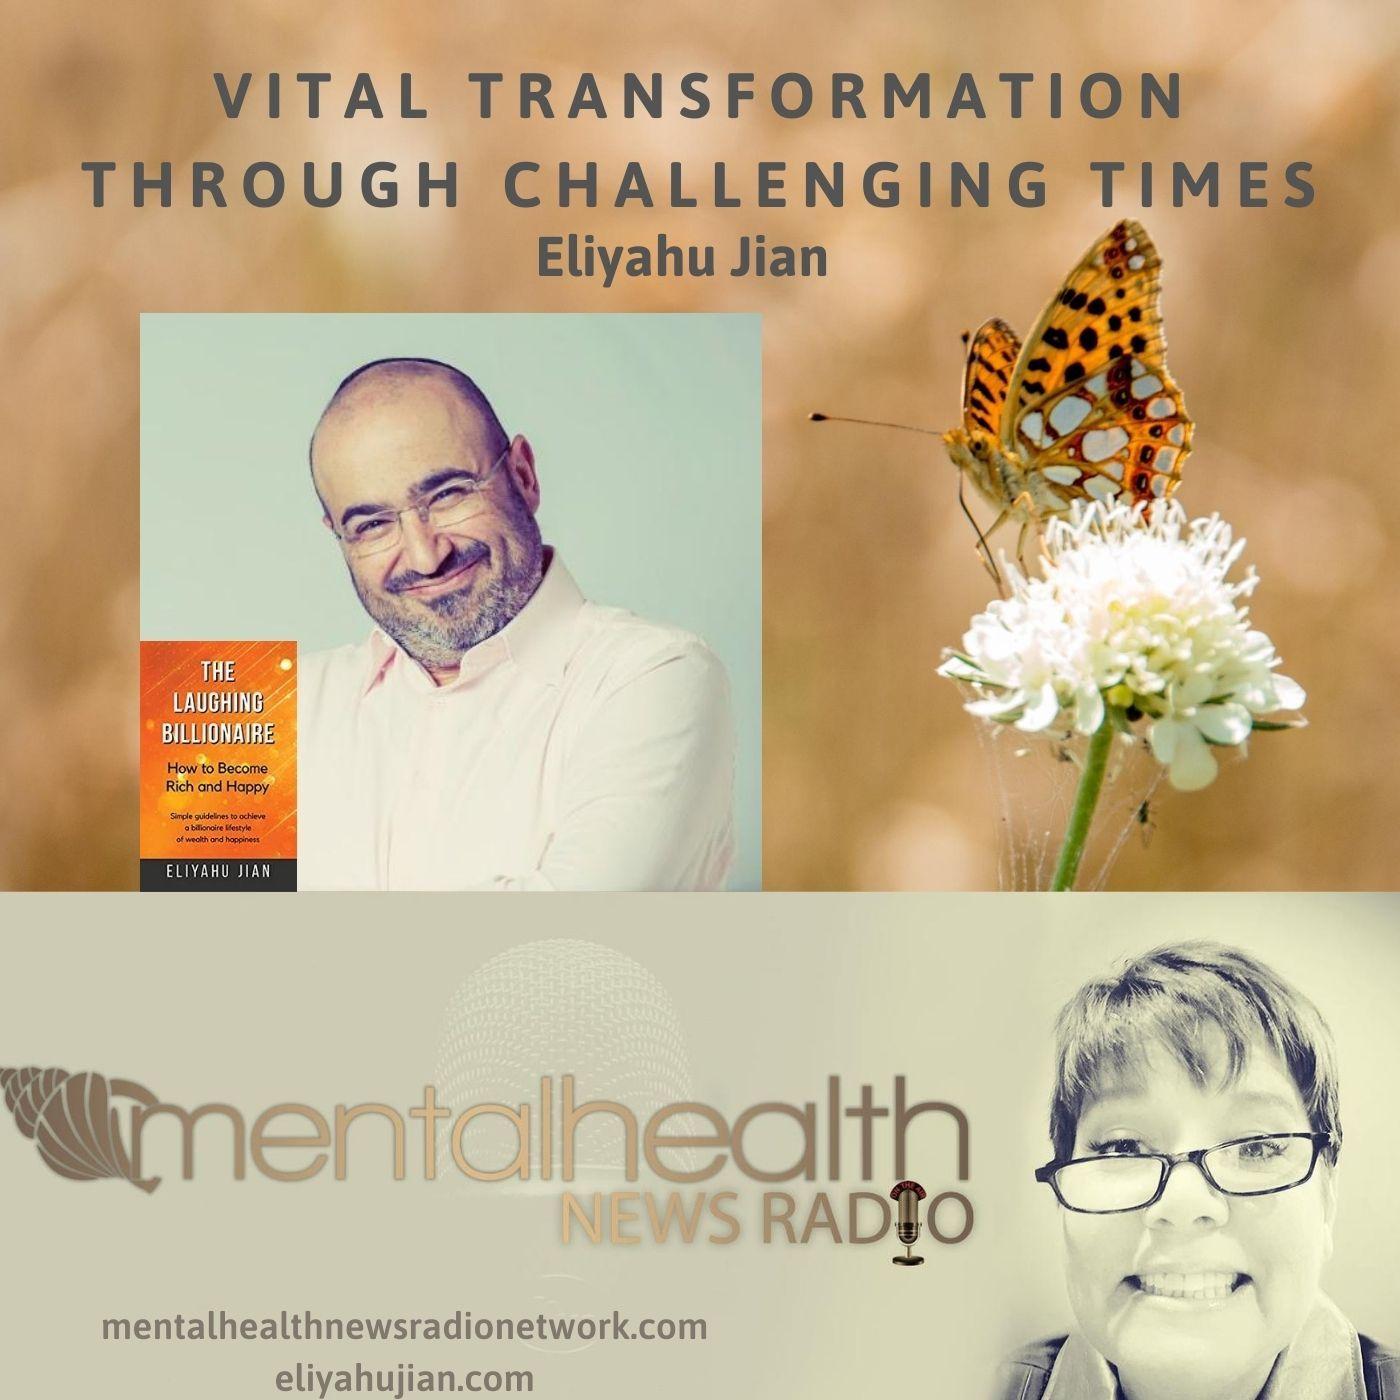 Mental Health News Radio - Vital Transformation Through Challenging Times